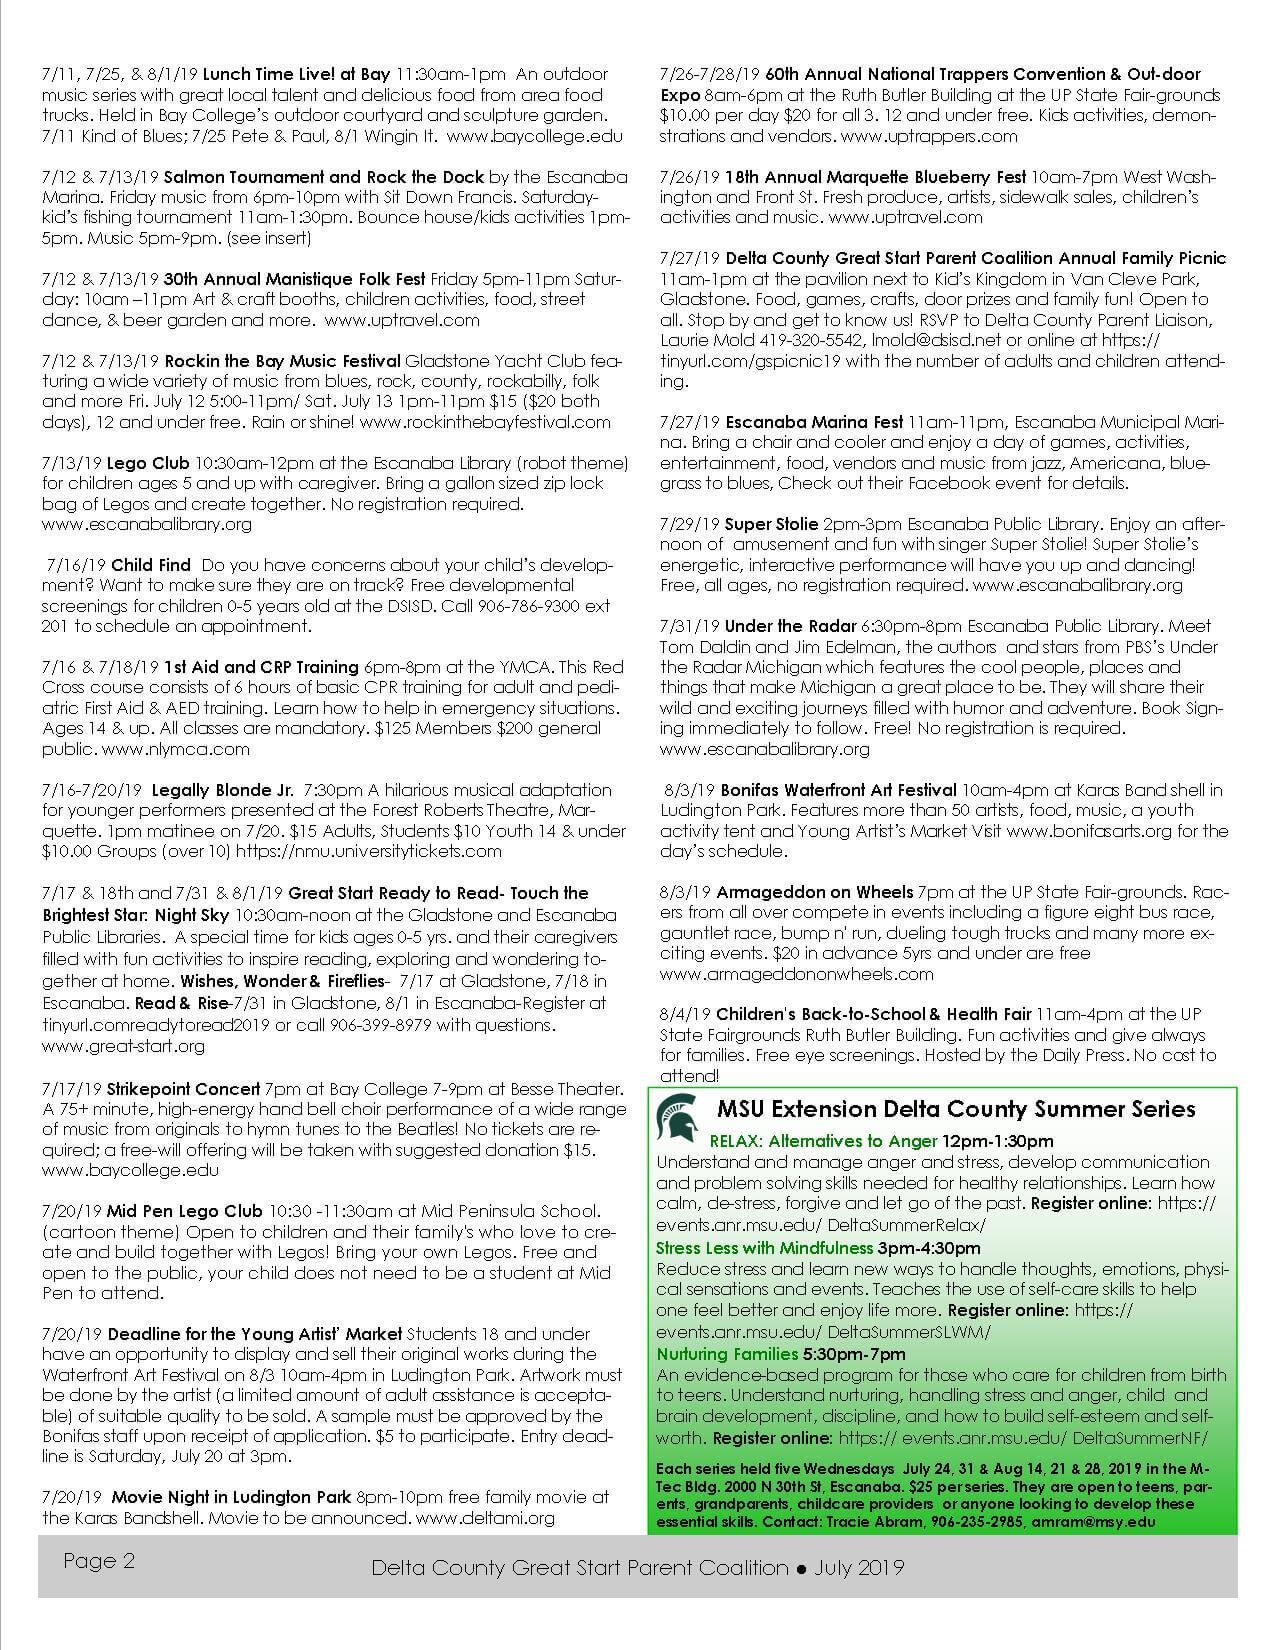 July 2019 Newsletter - Delta-Schoolcraft County Great Start